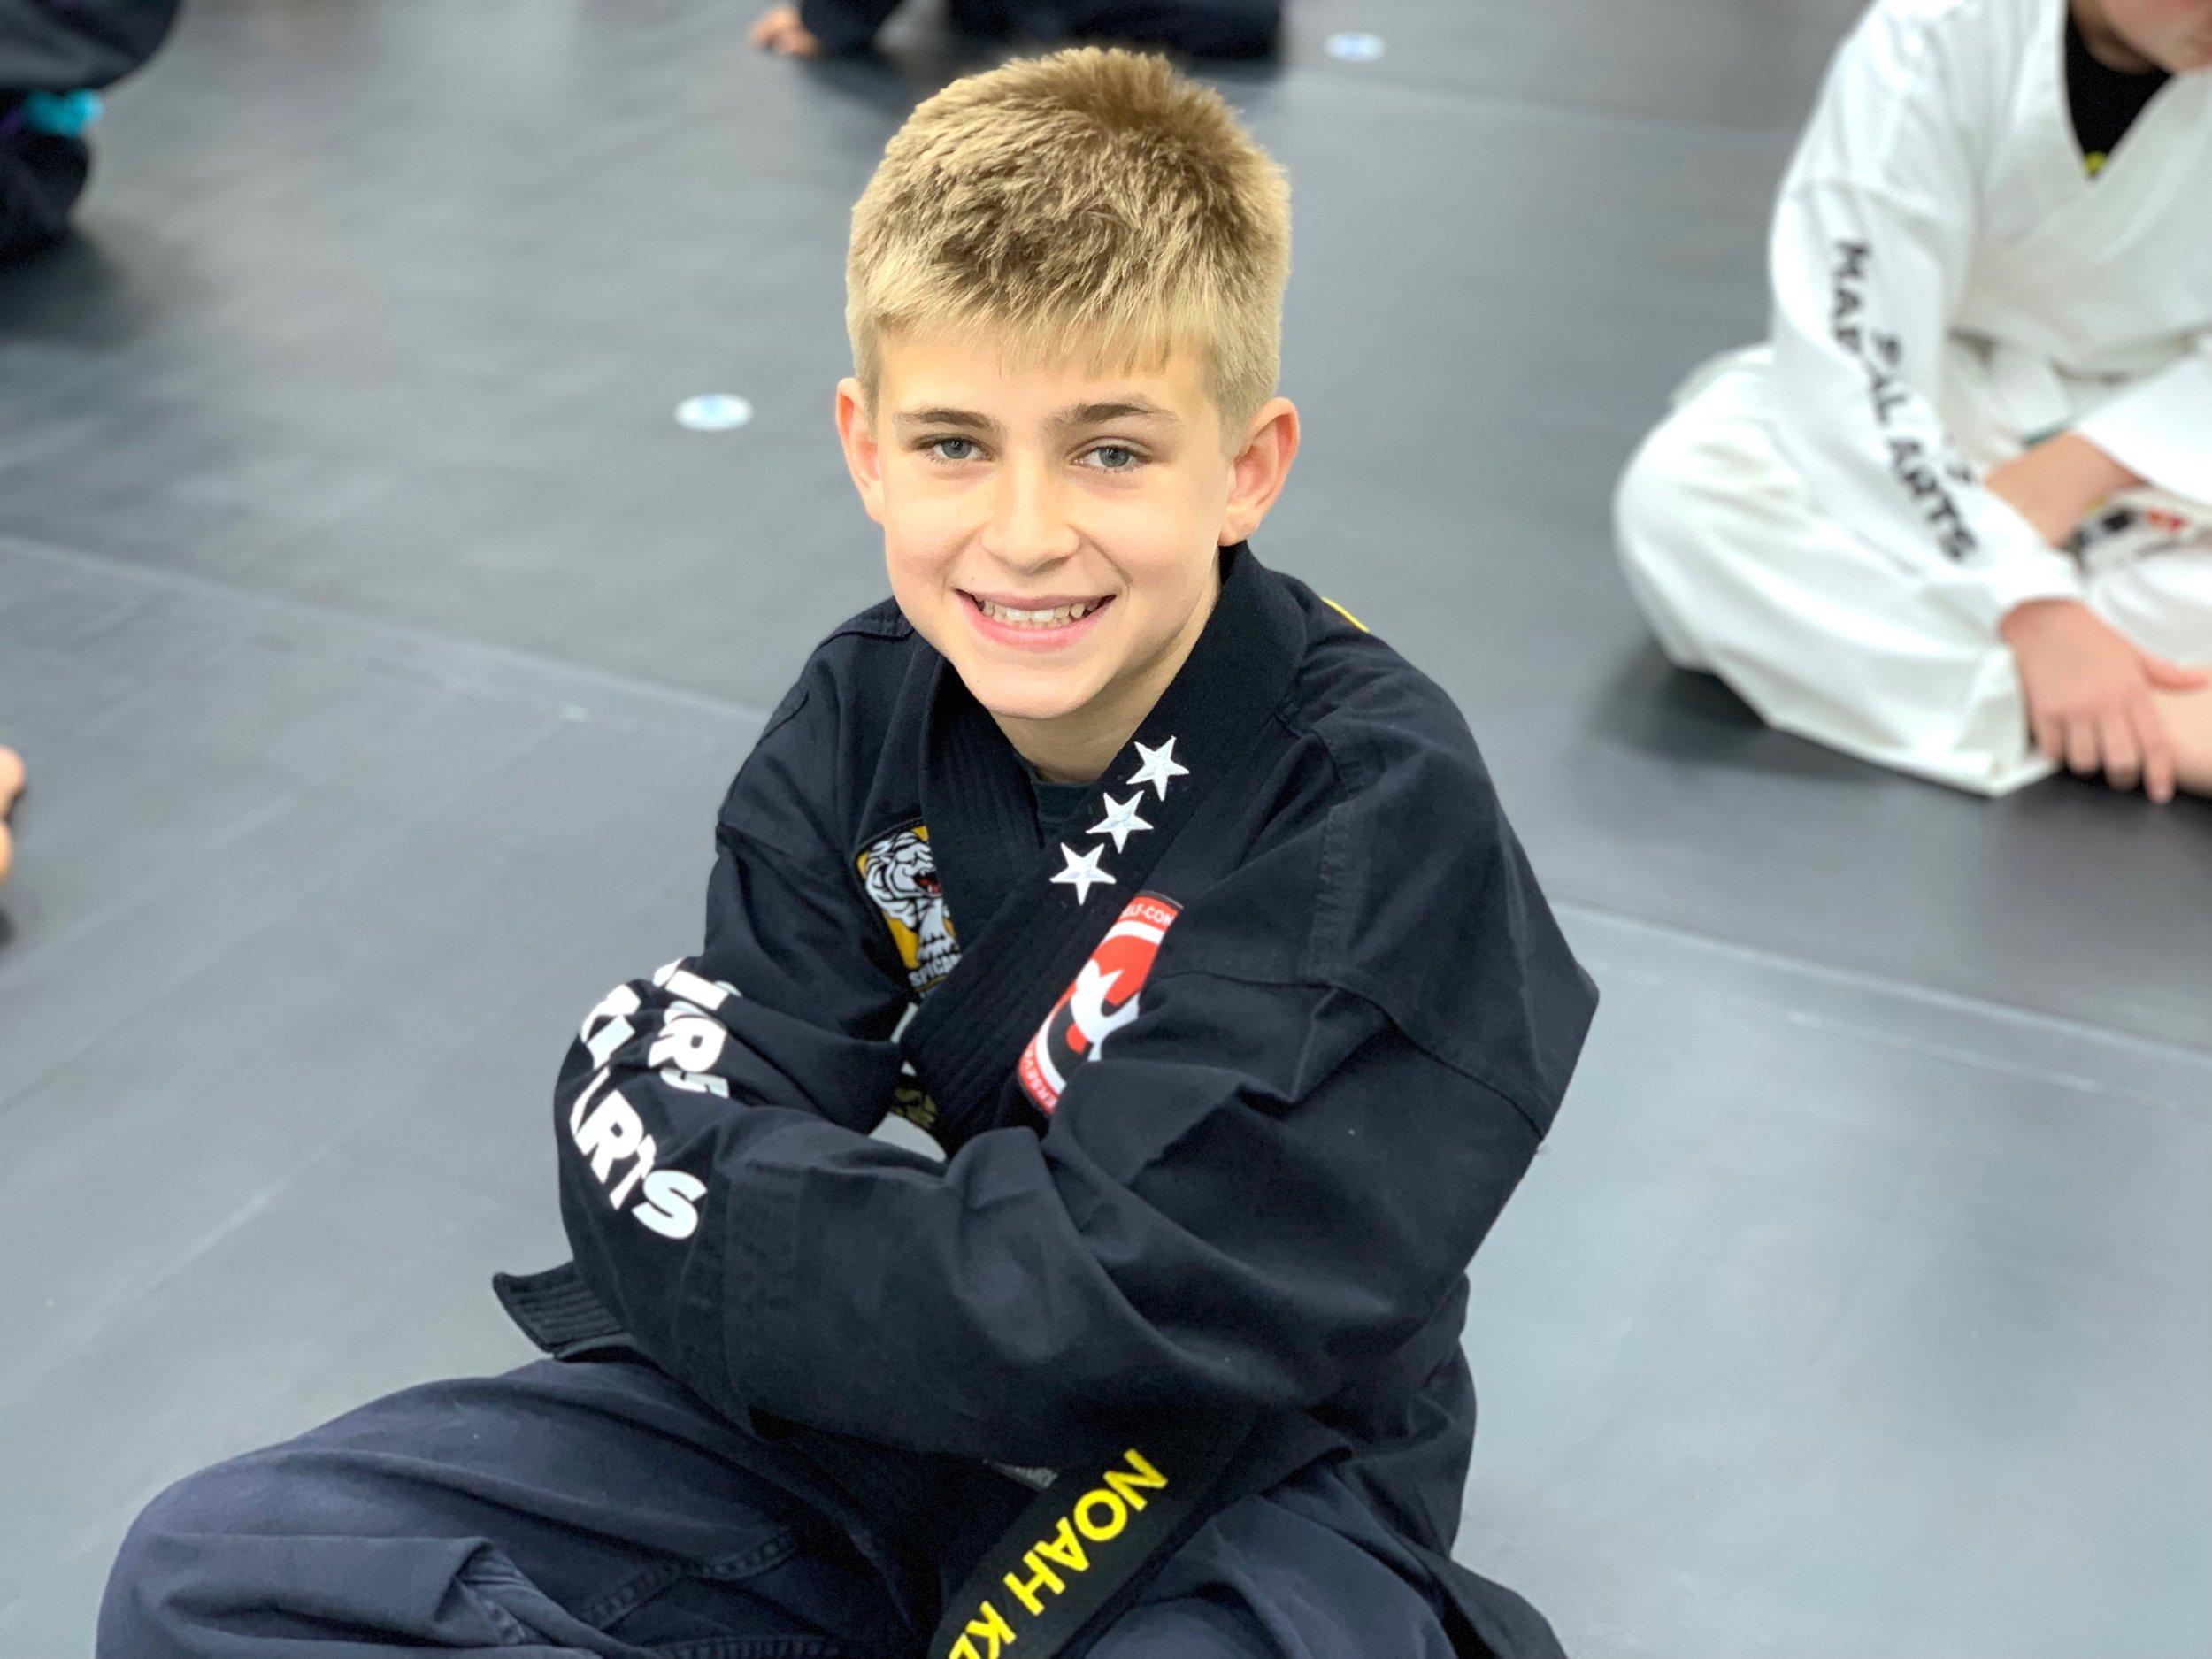 karate-kids-program-souhtlake-keller-grapevine-texas00037.jpeg